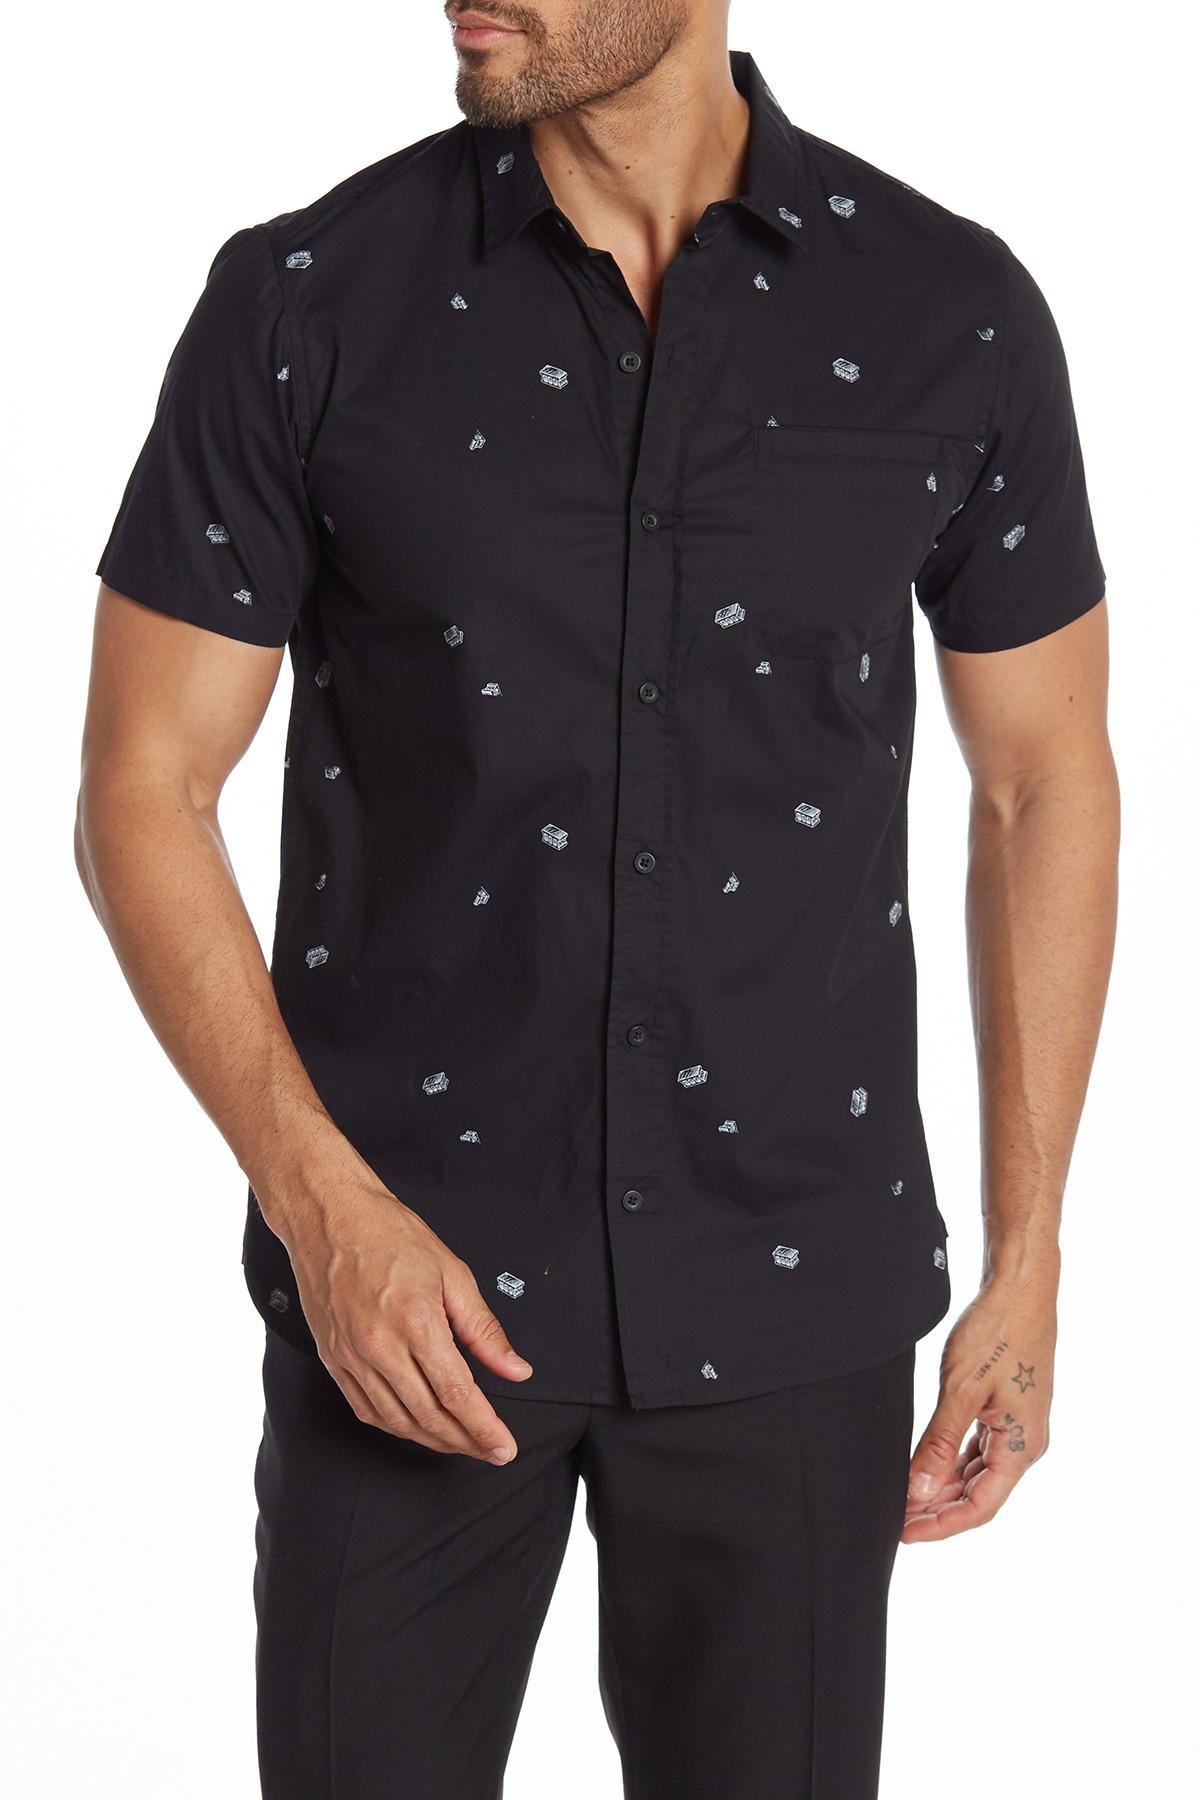 df9f8a8cfa148 Lyst - Tavik Porter Printed Oxford Shirt in Black for Men